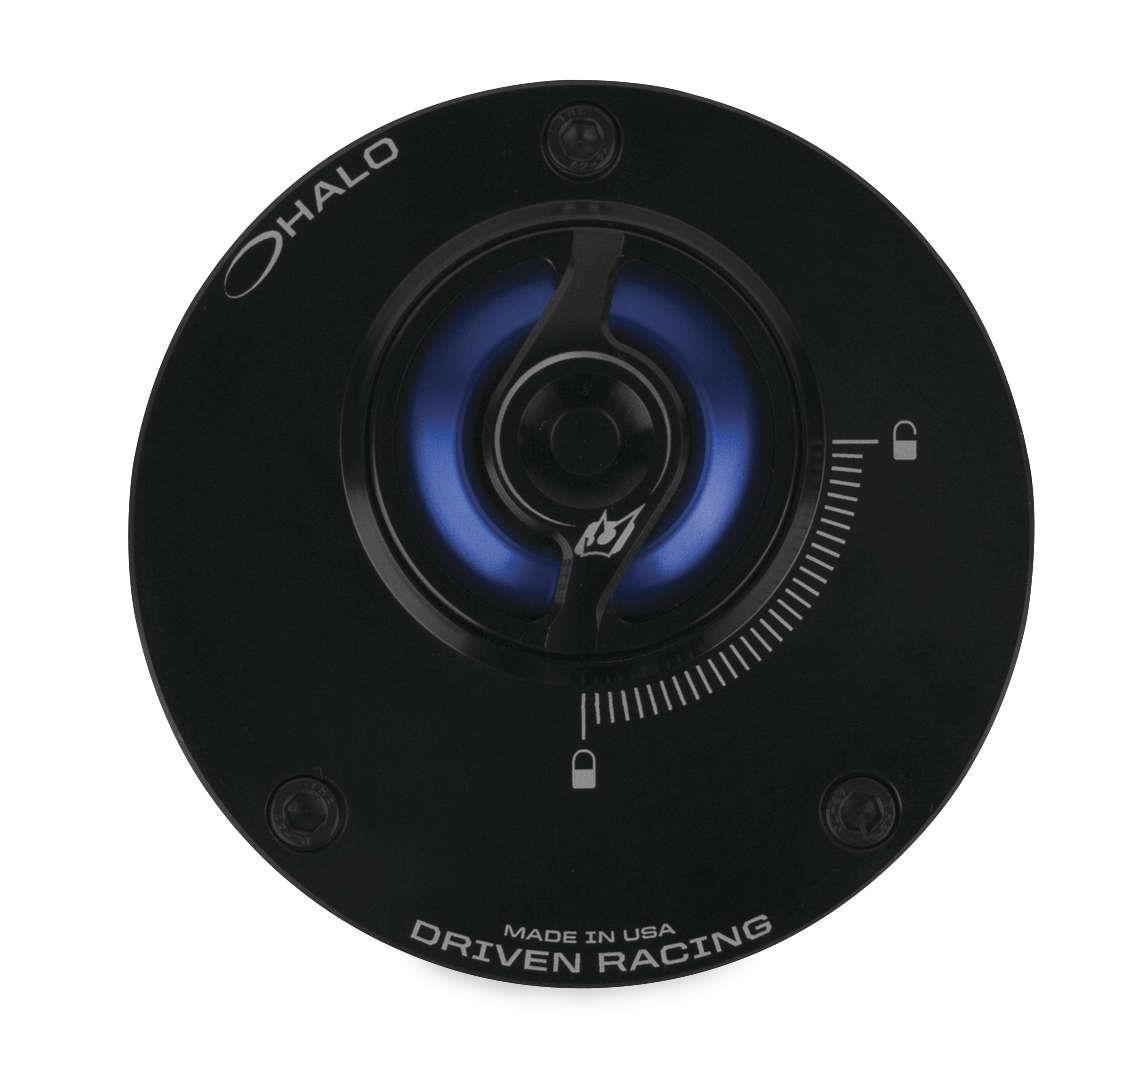 Driven Racing DHFC-BL Halo Fuel Cap Blue